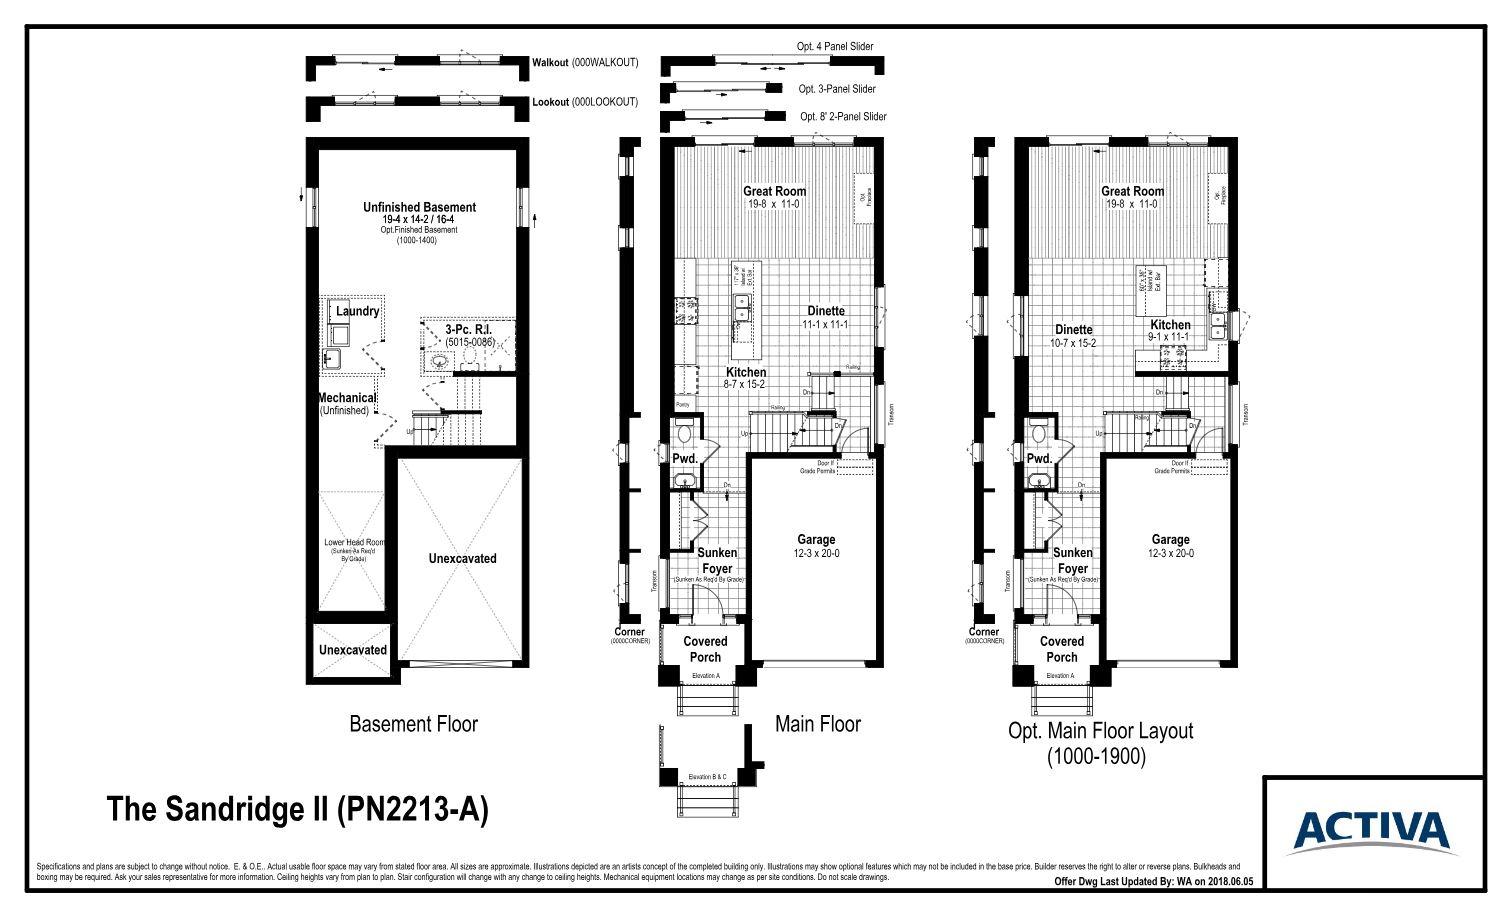 Doon South The Sandridge Ii Floor Plans And Pricing